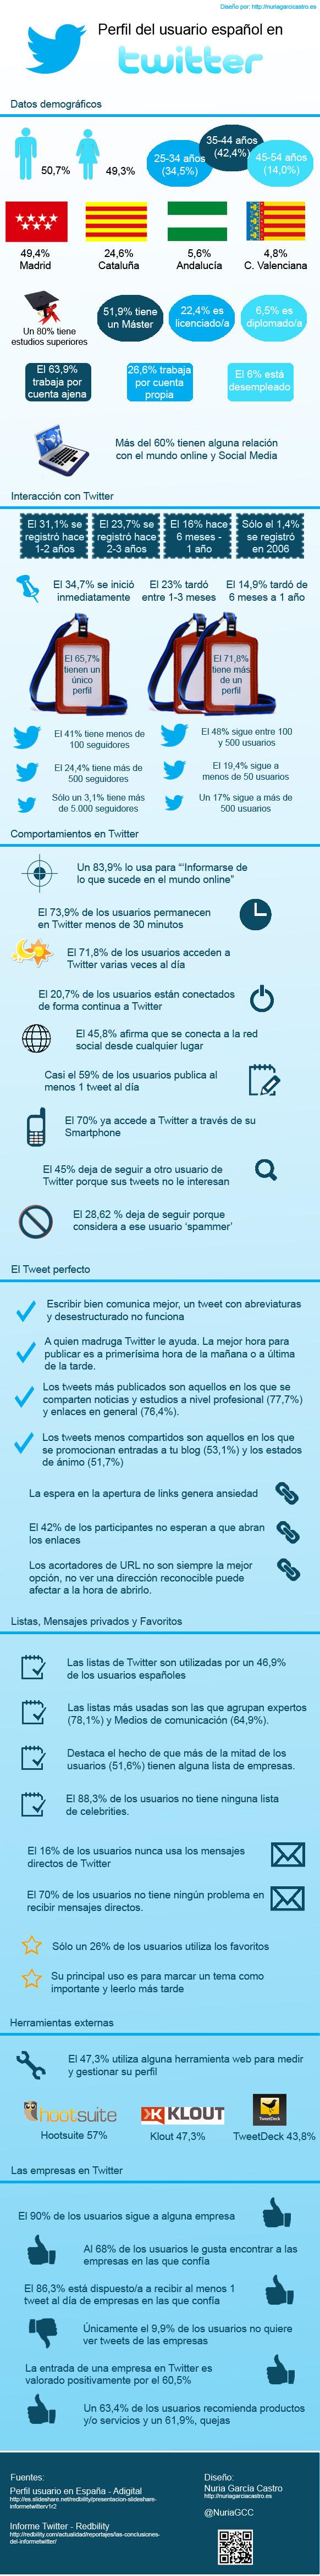 infografia_perfil_usuario_espanol_de_twitter